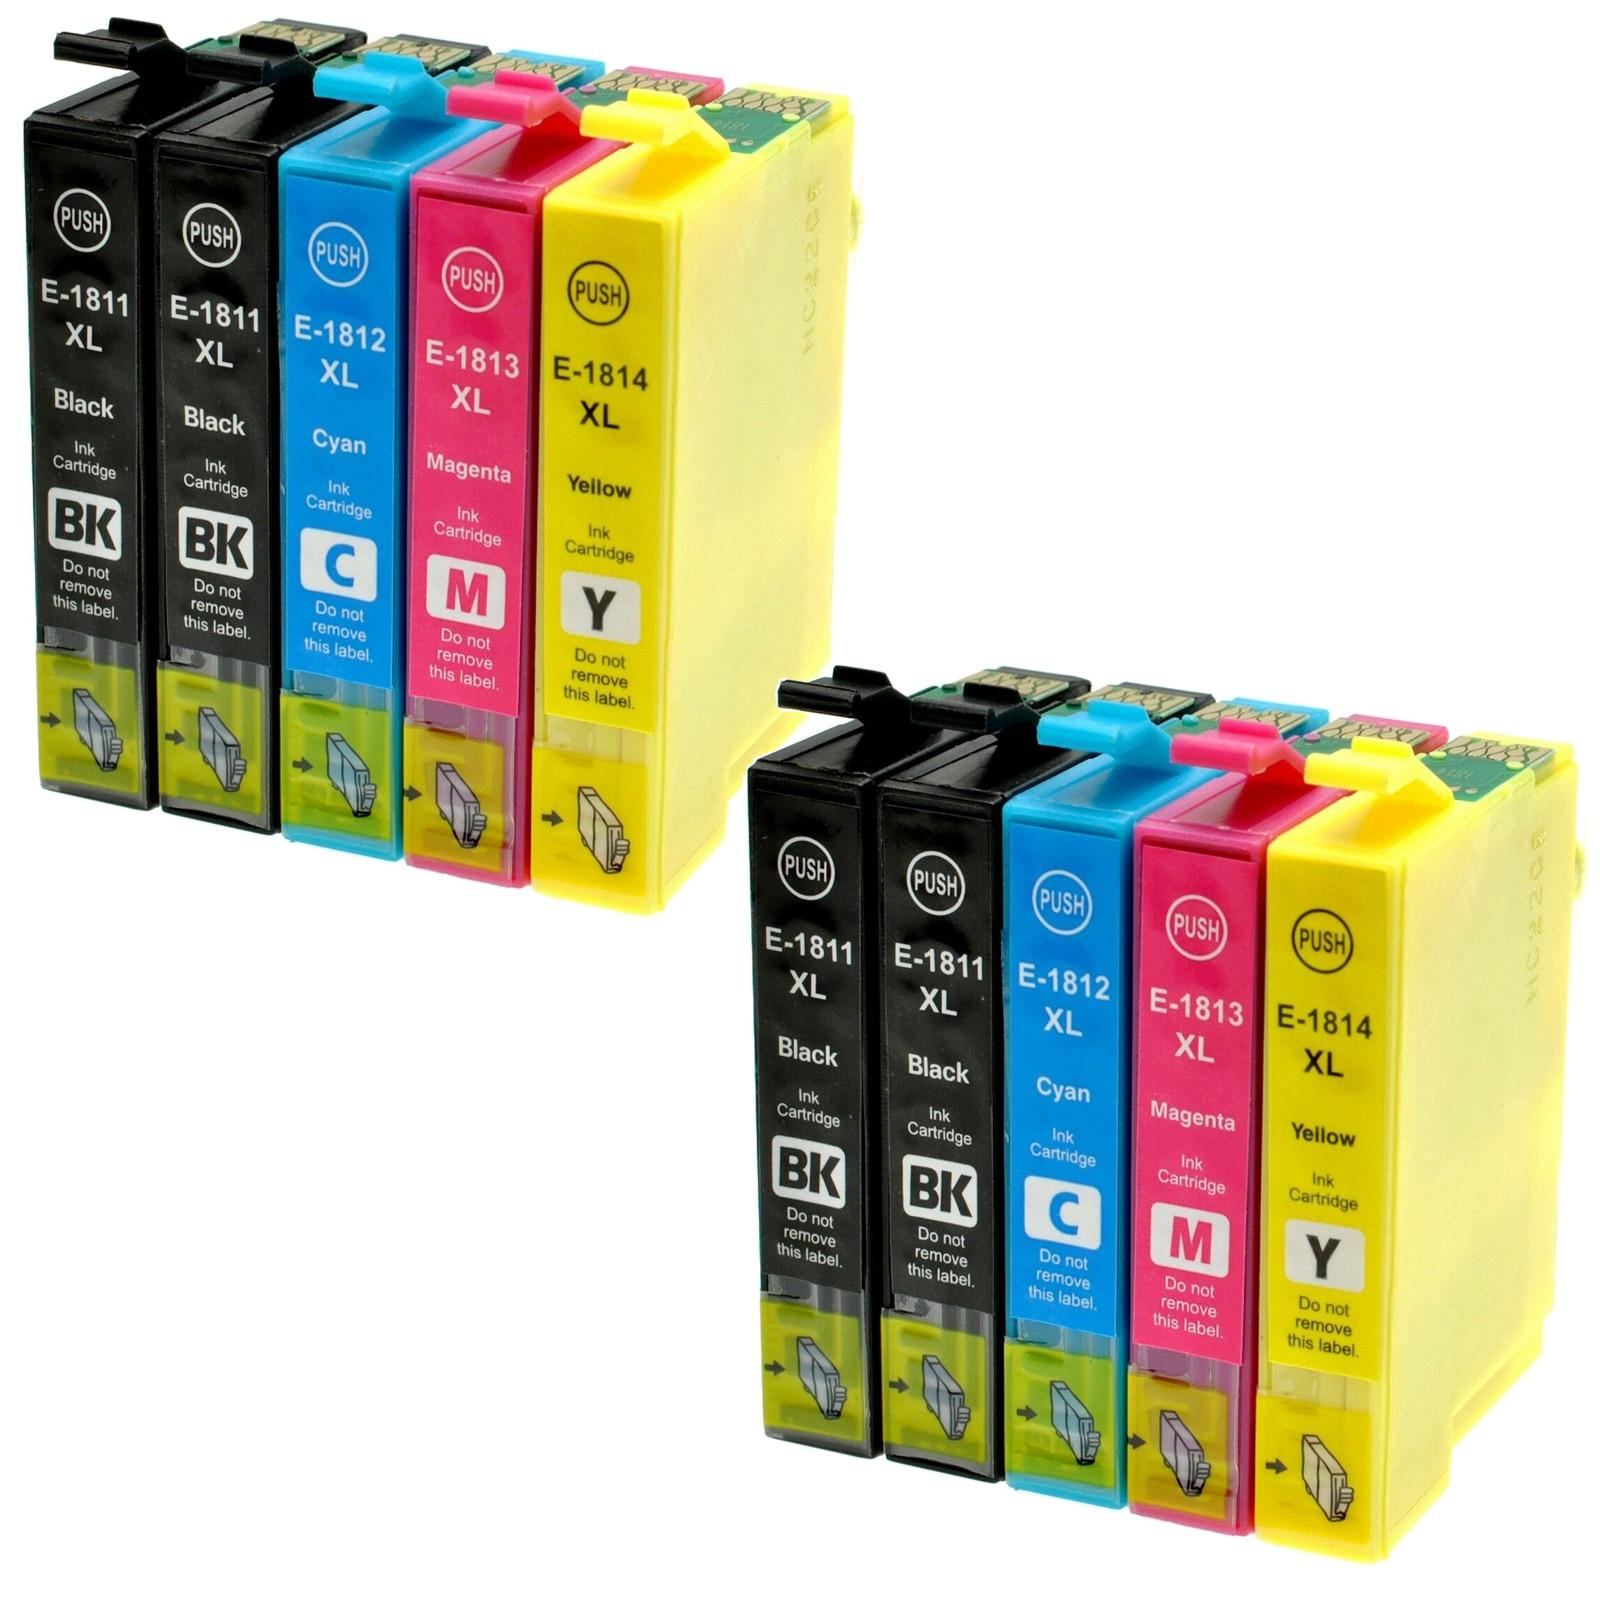 10 Cartuchos de tinta Modelo T18XL T 18XL t1811 t1812 t1813 t1814 Compatible con impresoras Epson XP302 XP305 XP402 XP405